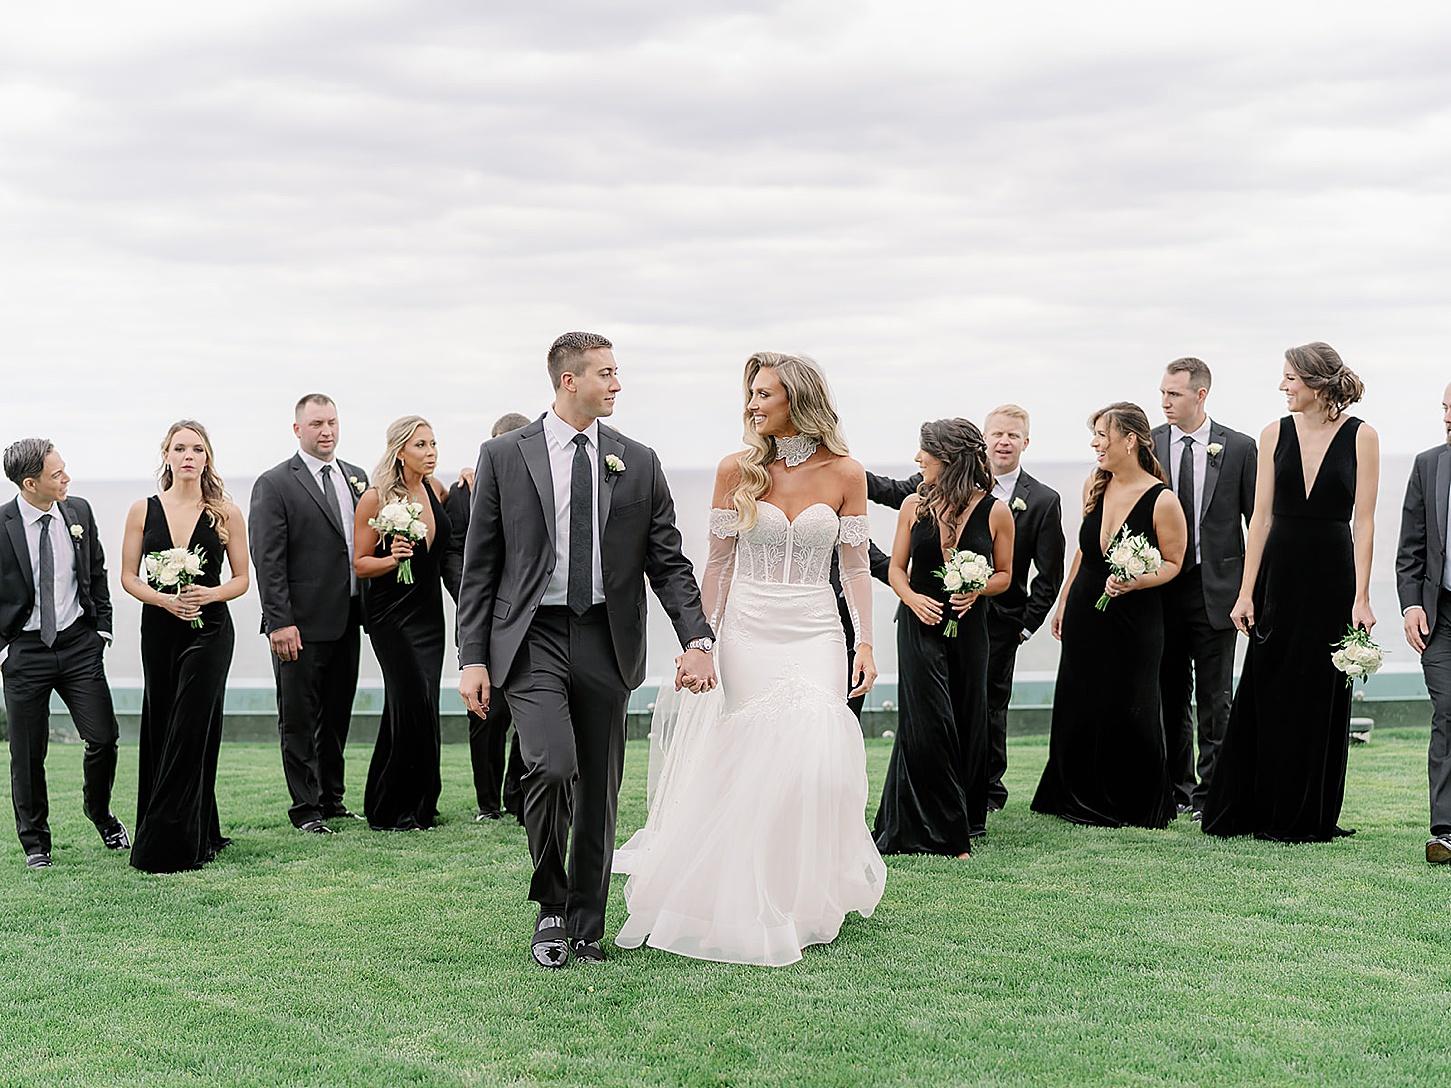 Atlantic City Wedding Photography Studio by Magdalena Studios Lexy Cha 0040